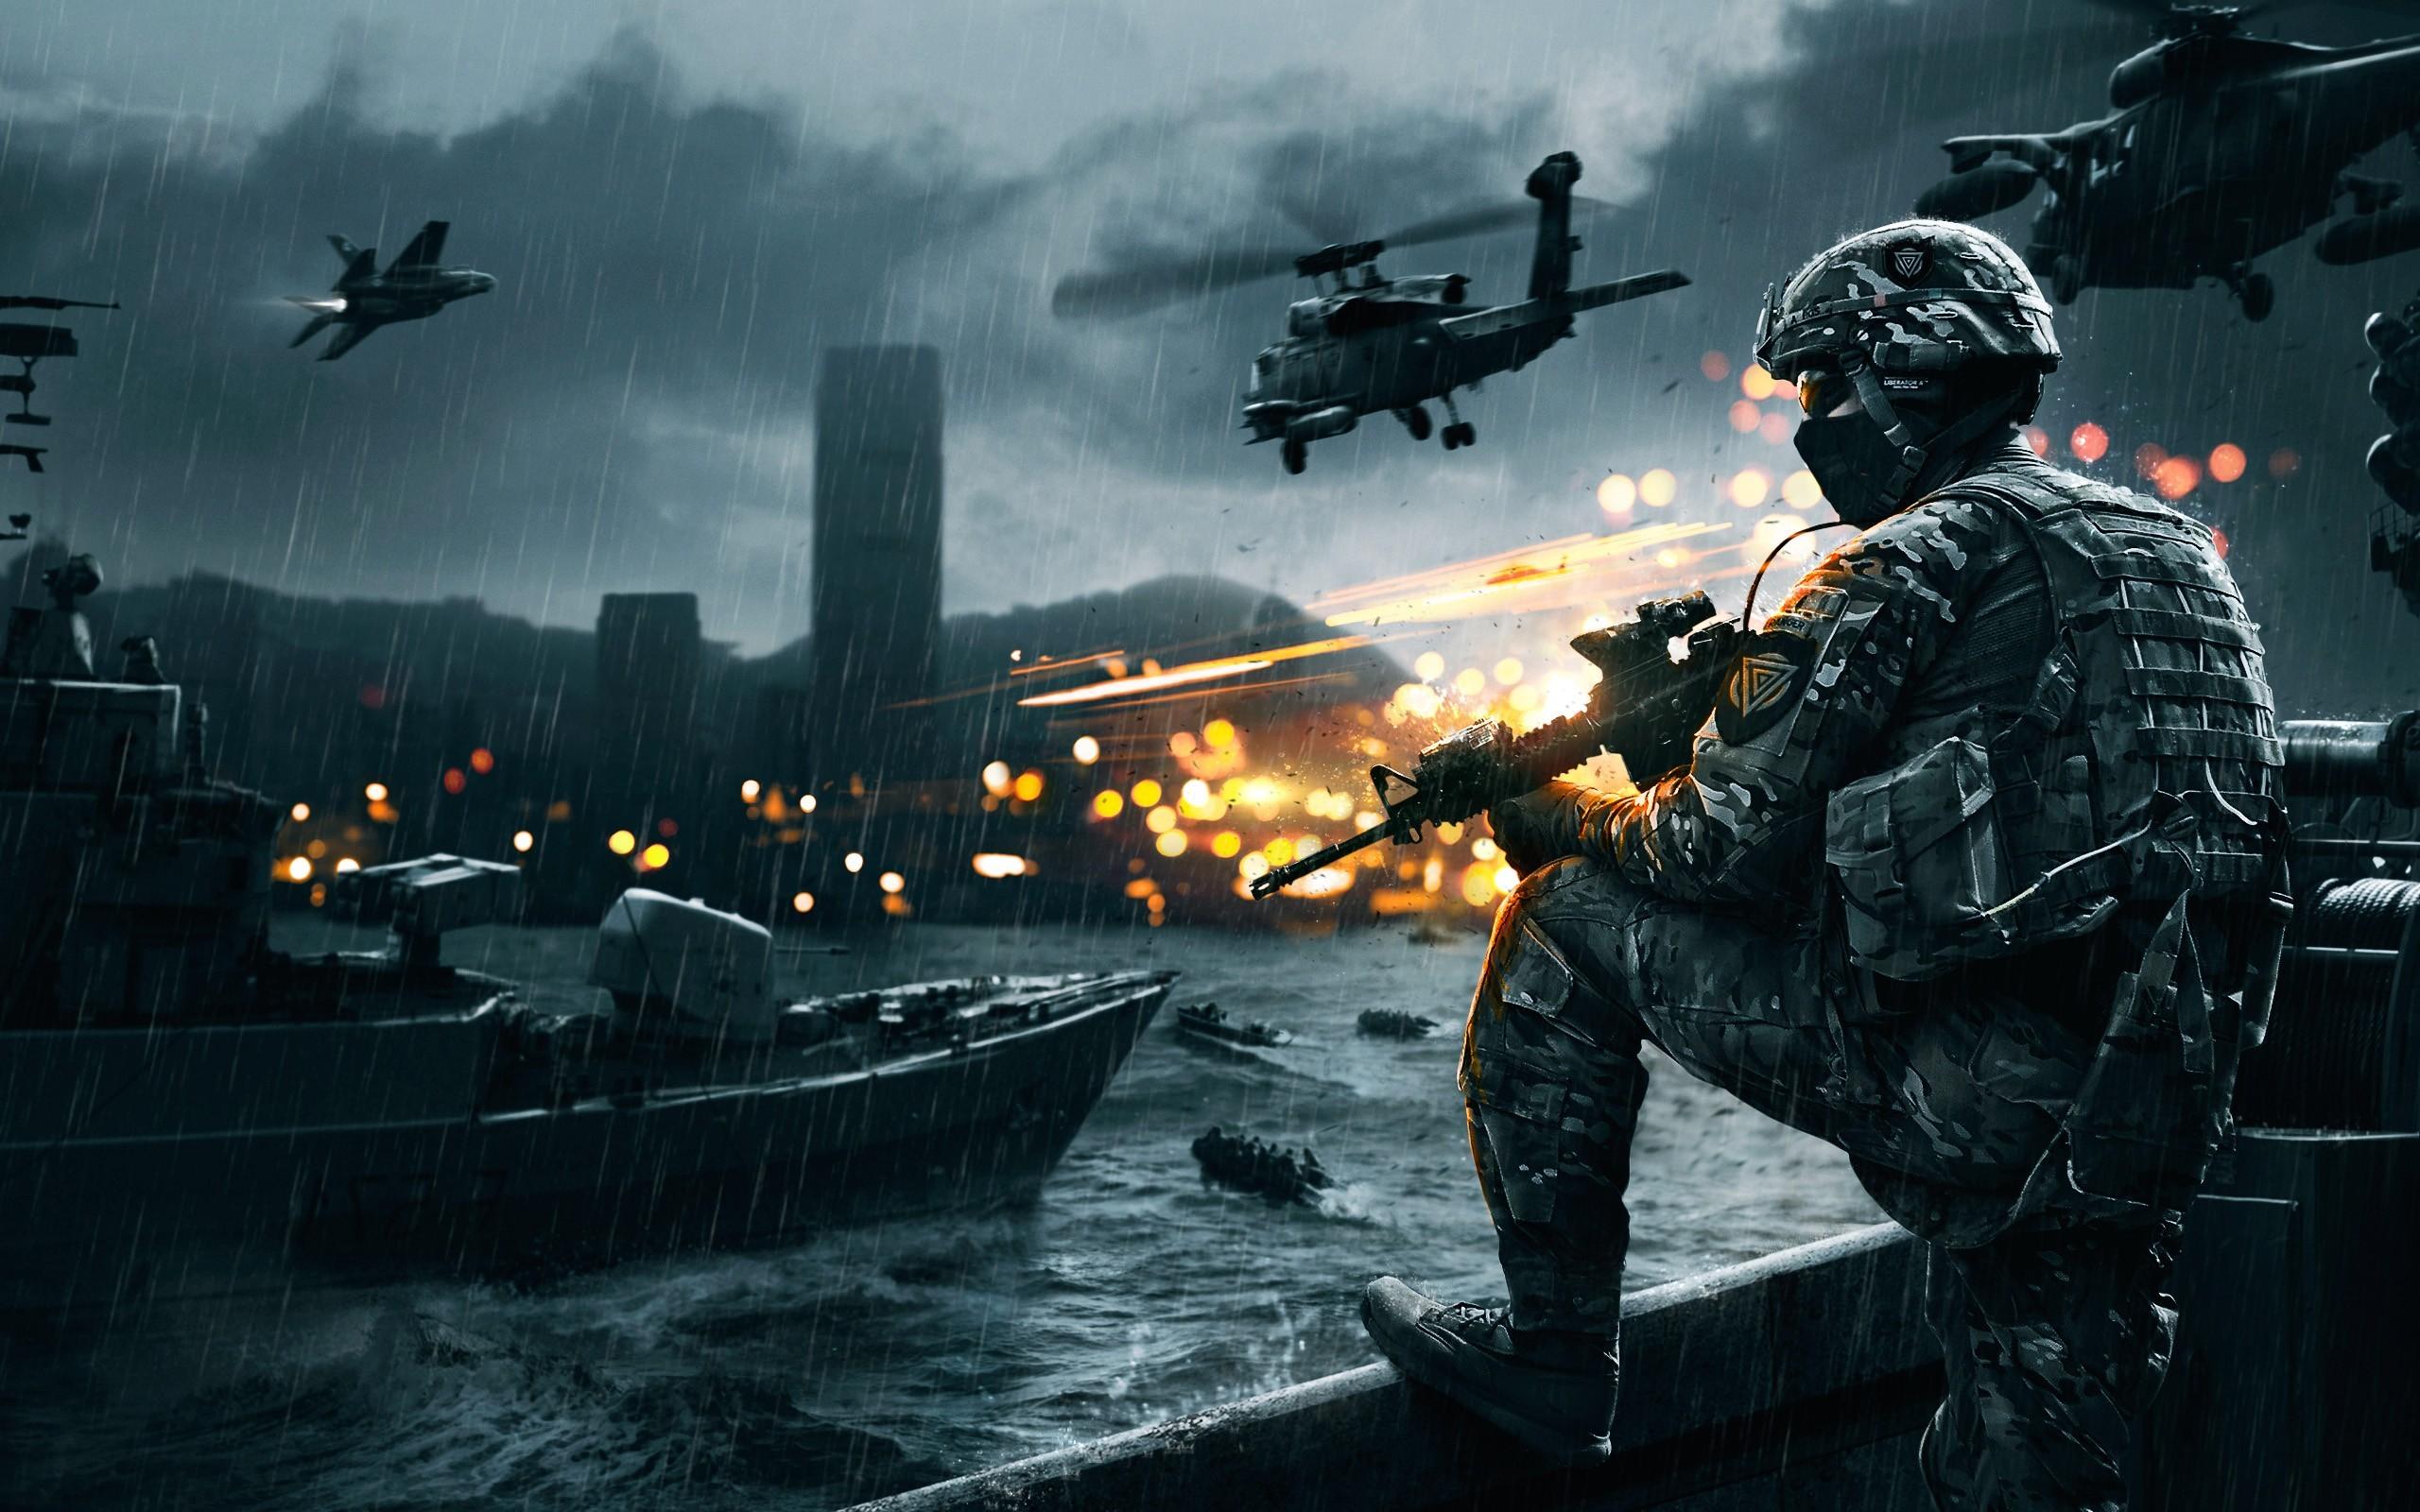 Cool Army Man Ready Wallpaper HD 8446 Wallpaper Wallpaper Screen 2560x1600